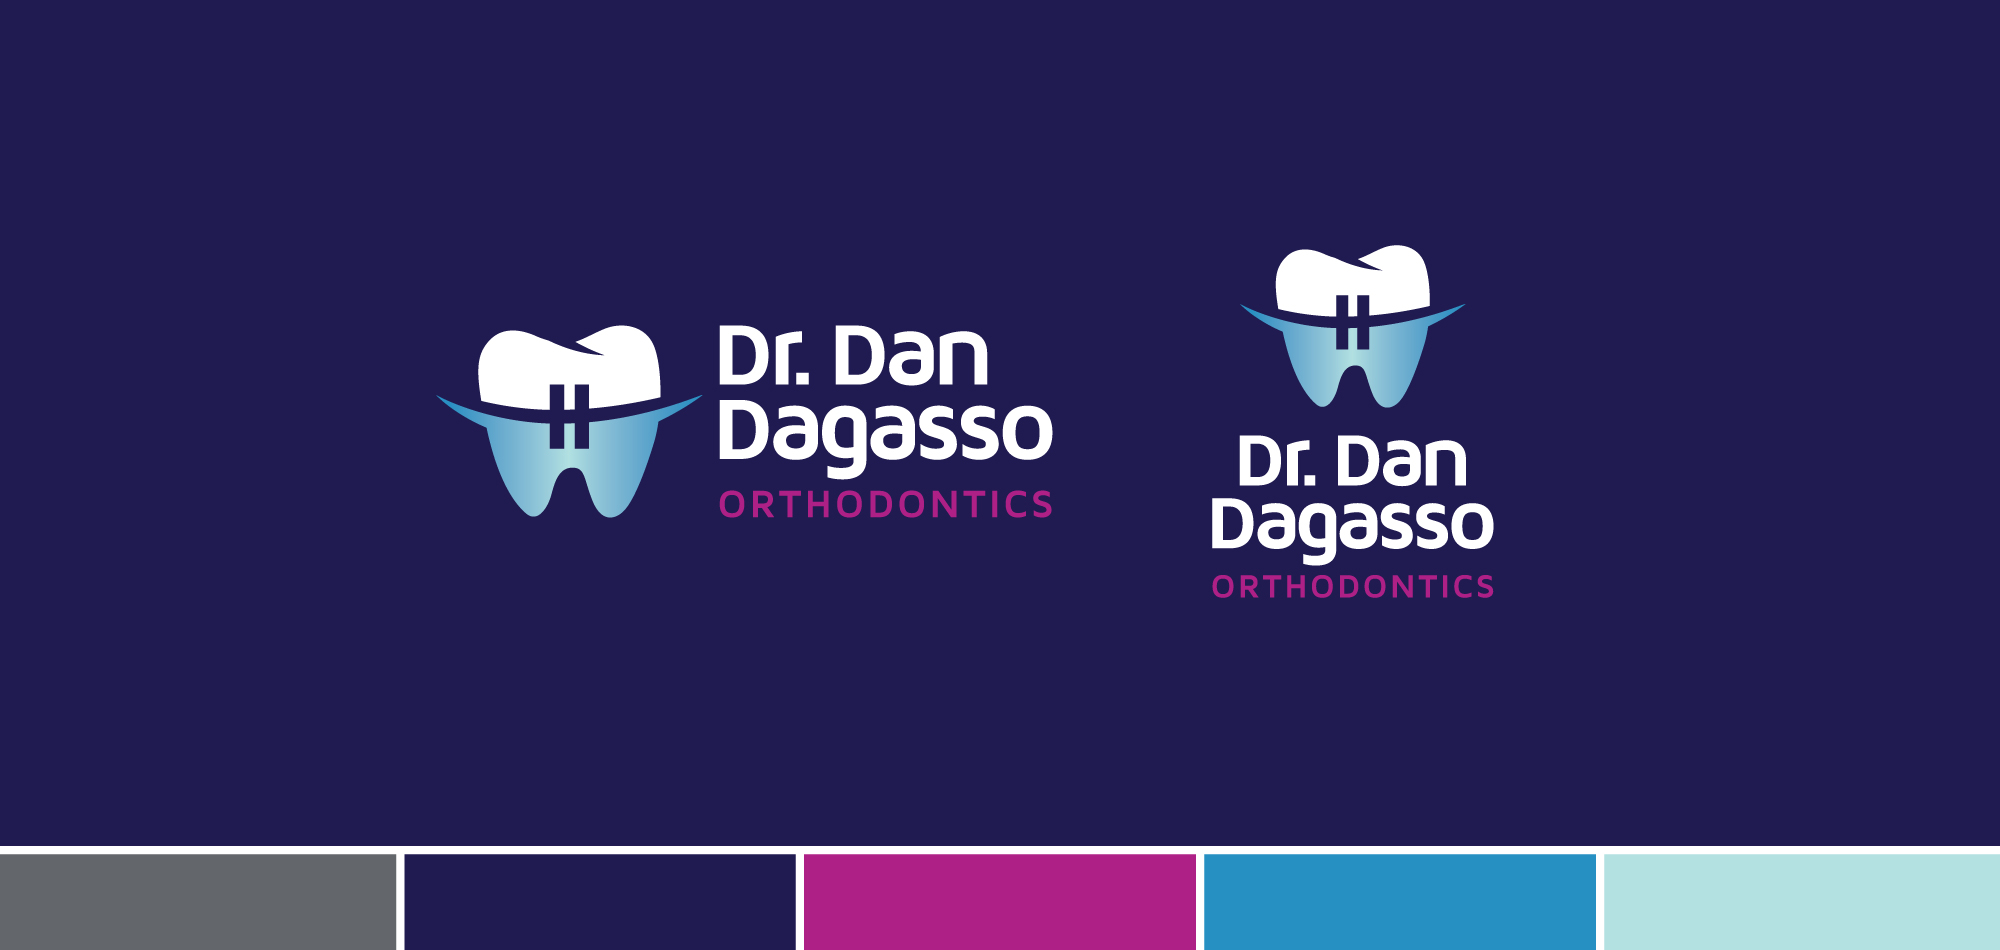 dagassoortho_logos_colours